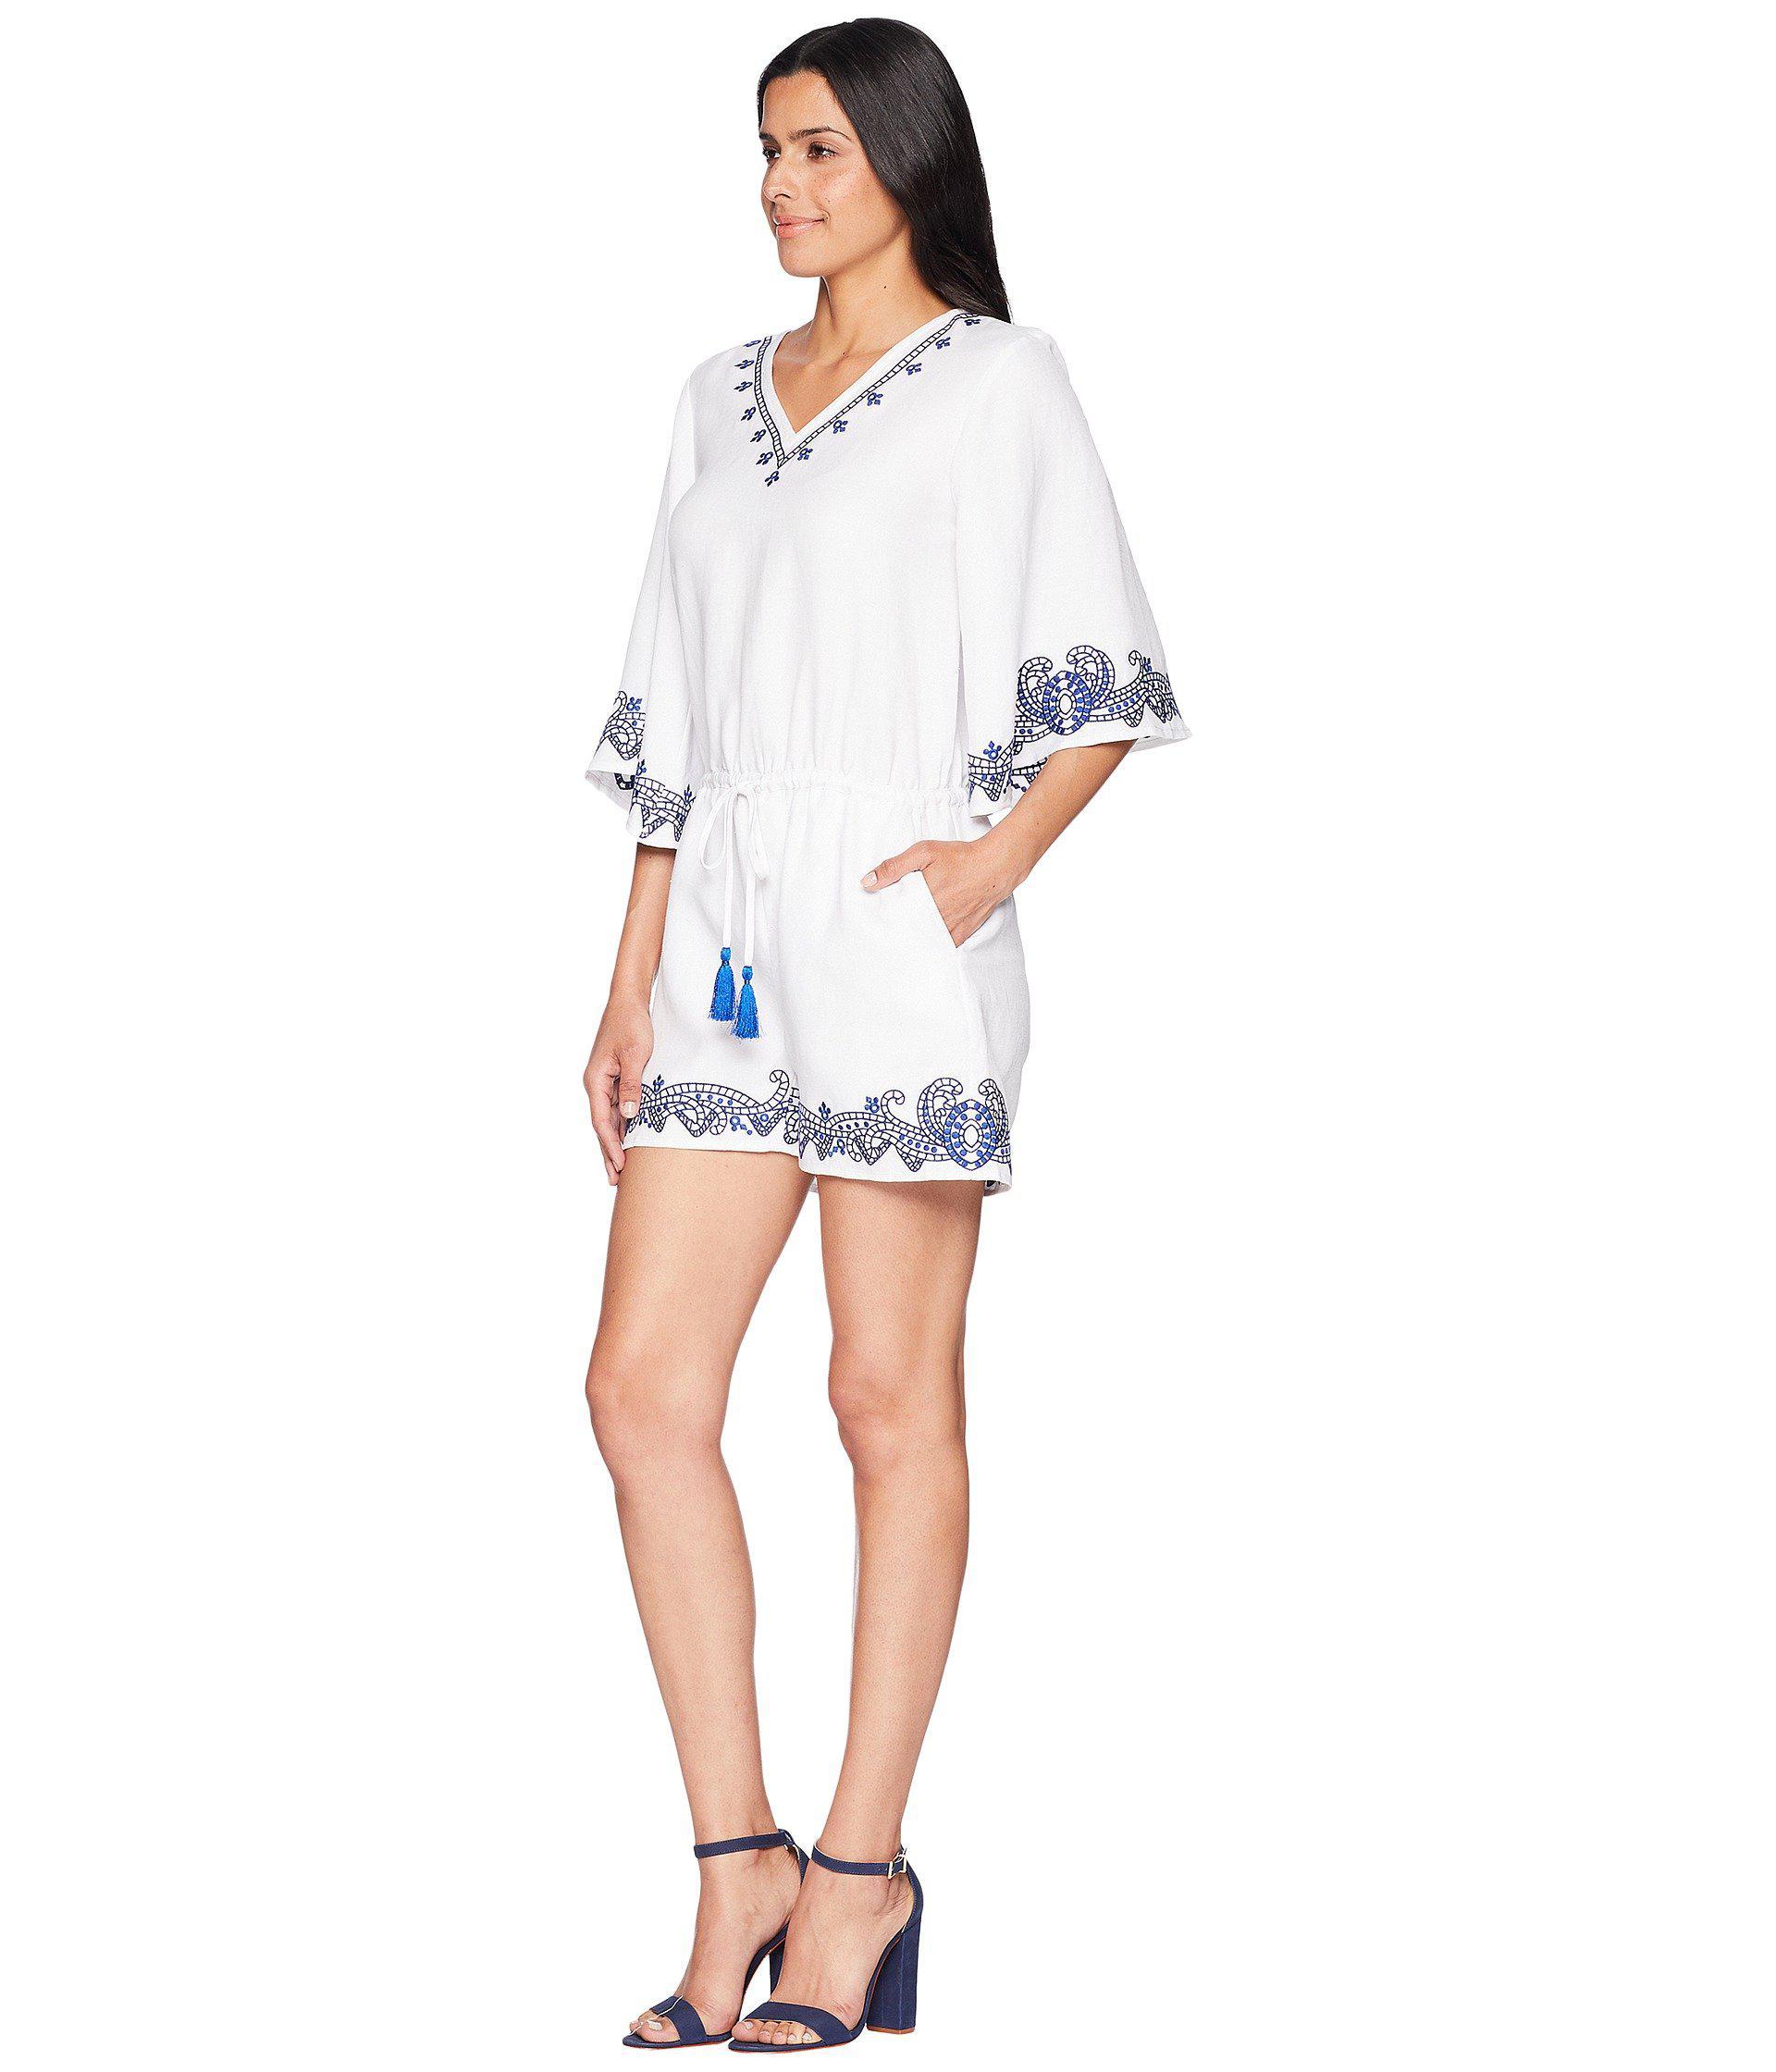 0ef4a06bef18 Lyst - Lauren by Ralph Lauren Embroidered Linen Romper in White - Save 26%